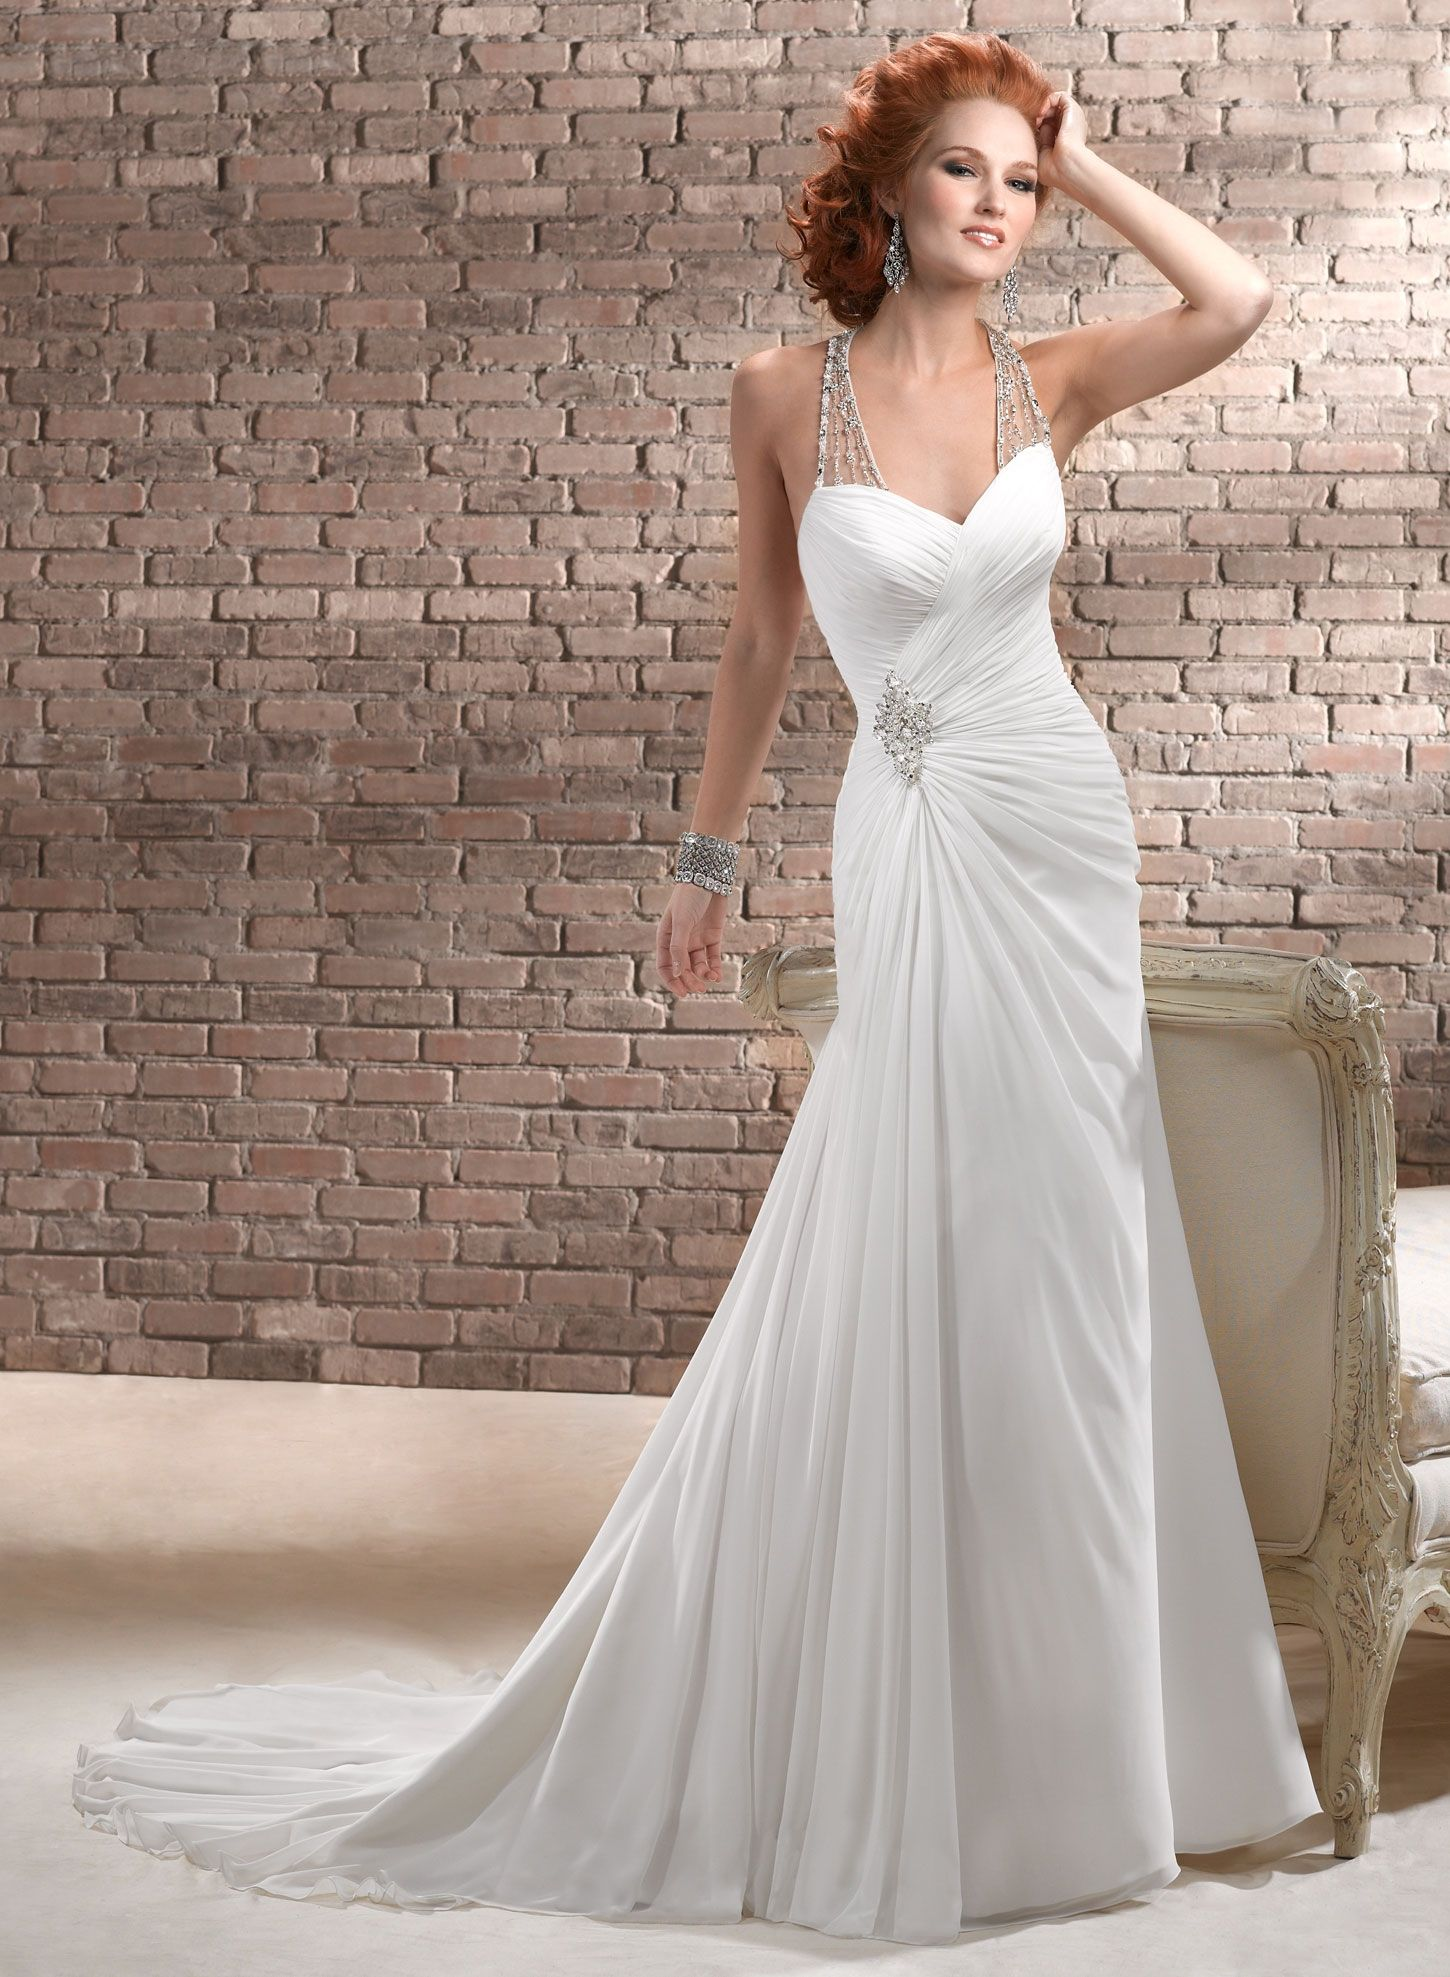 See More Bridal Wedding Gowns Long Island Photos From Bridal Suite Of Centereach On Liweddd Wedding Dresses Court Train Wedding Dress Destination Wedding Dress